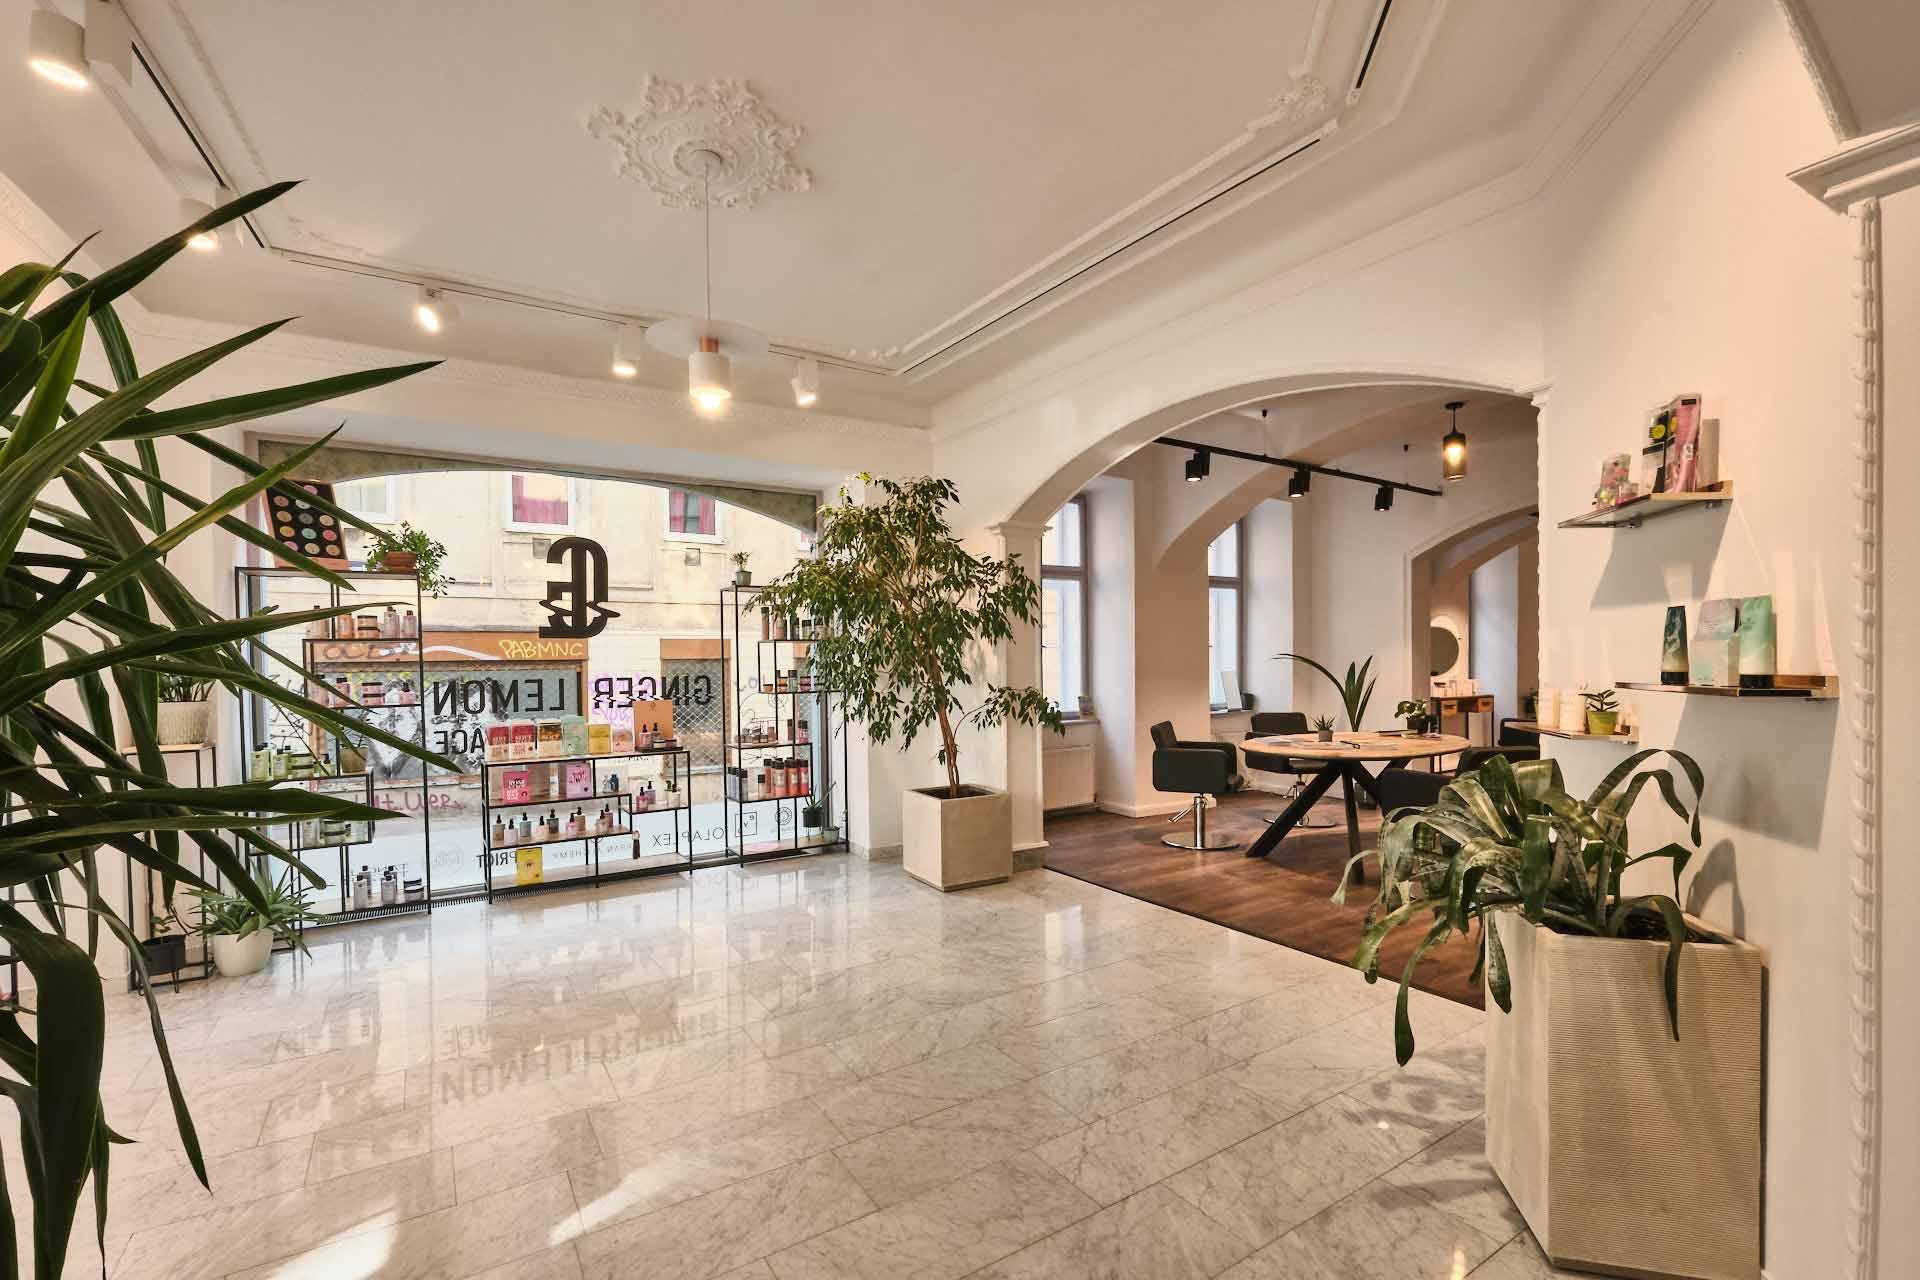 shop+webshop+friseurshop+zubehoer+tangle+teezer+gingerlemon+urbanalchemy+newflag+olaplex+6+5+4+3+1060+wien+interior+design.jpg